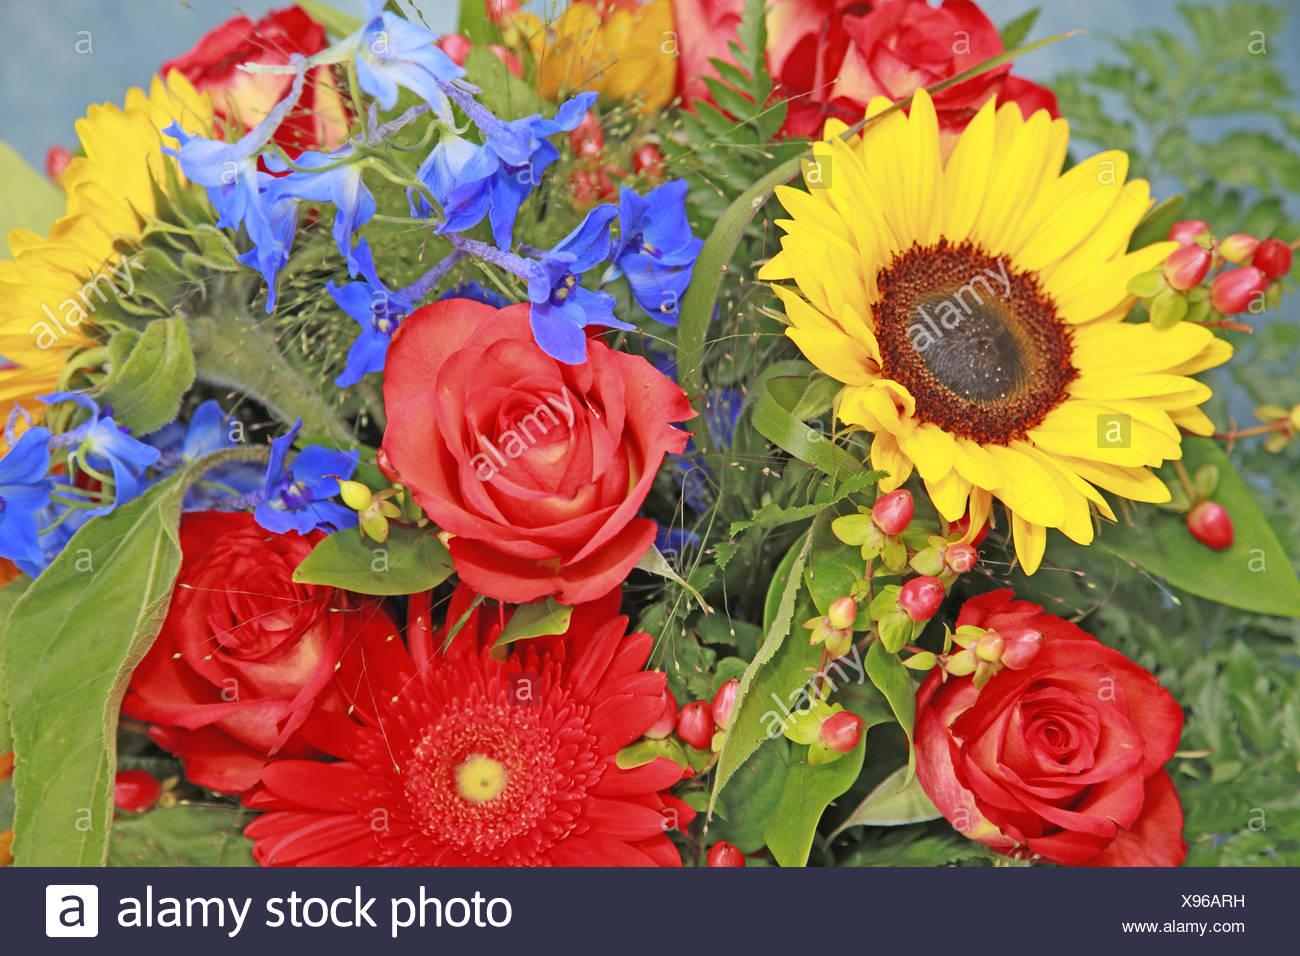 Yellow Roses Sunflower Flowers Stock Photos & Yellow Roses Sunflower ...